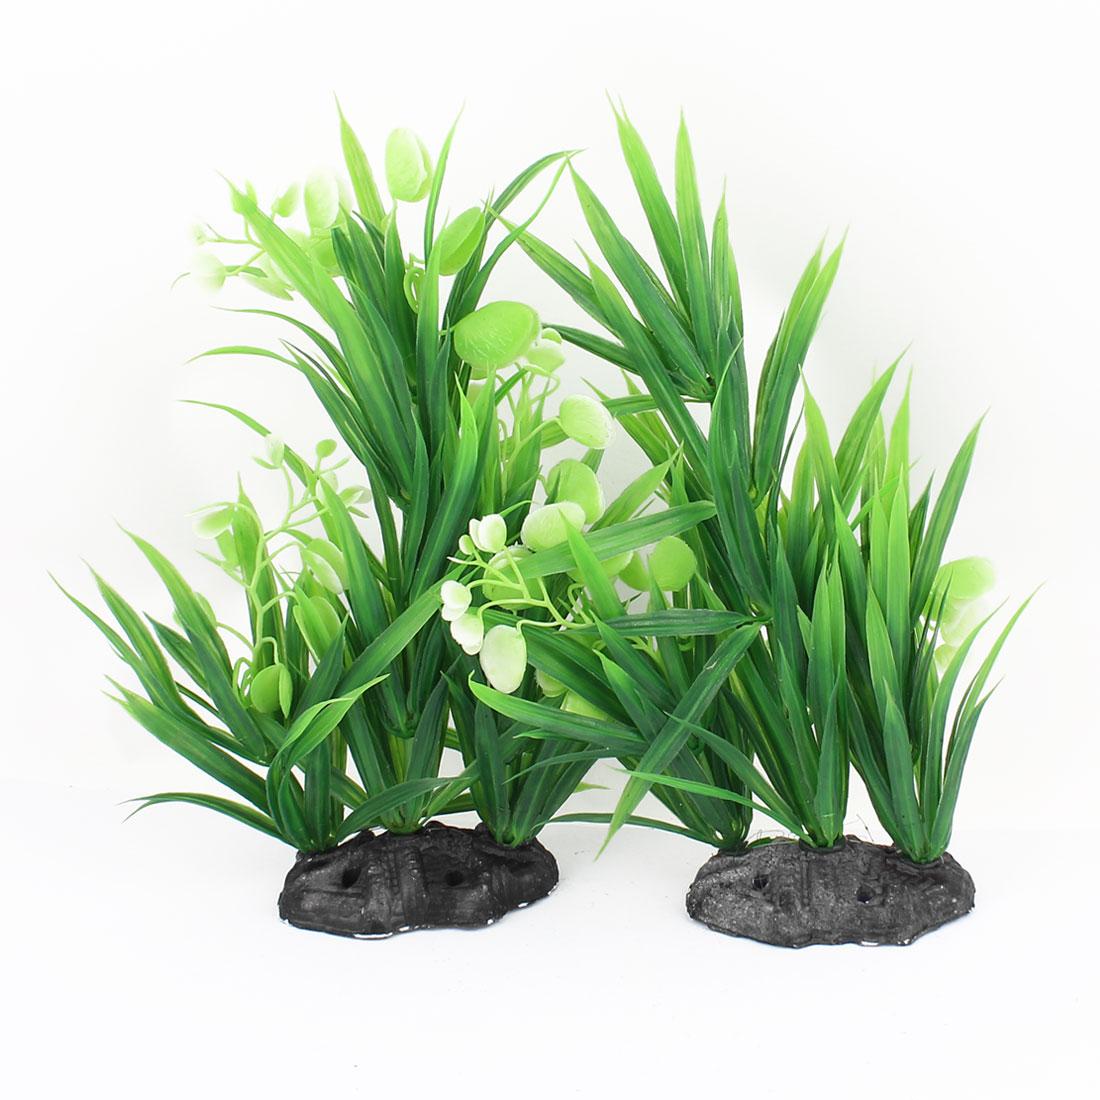 Ceramic Base Plastic Sea Weeds Grass Aquarium Plants Decor 2pcs